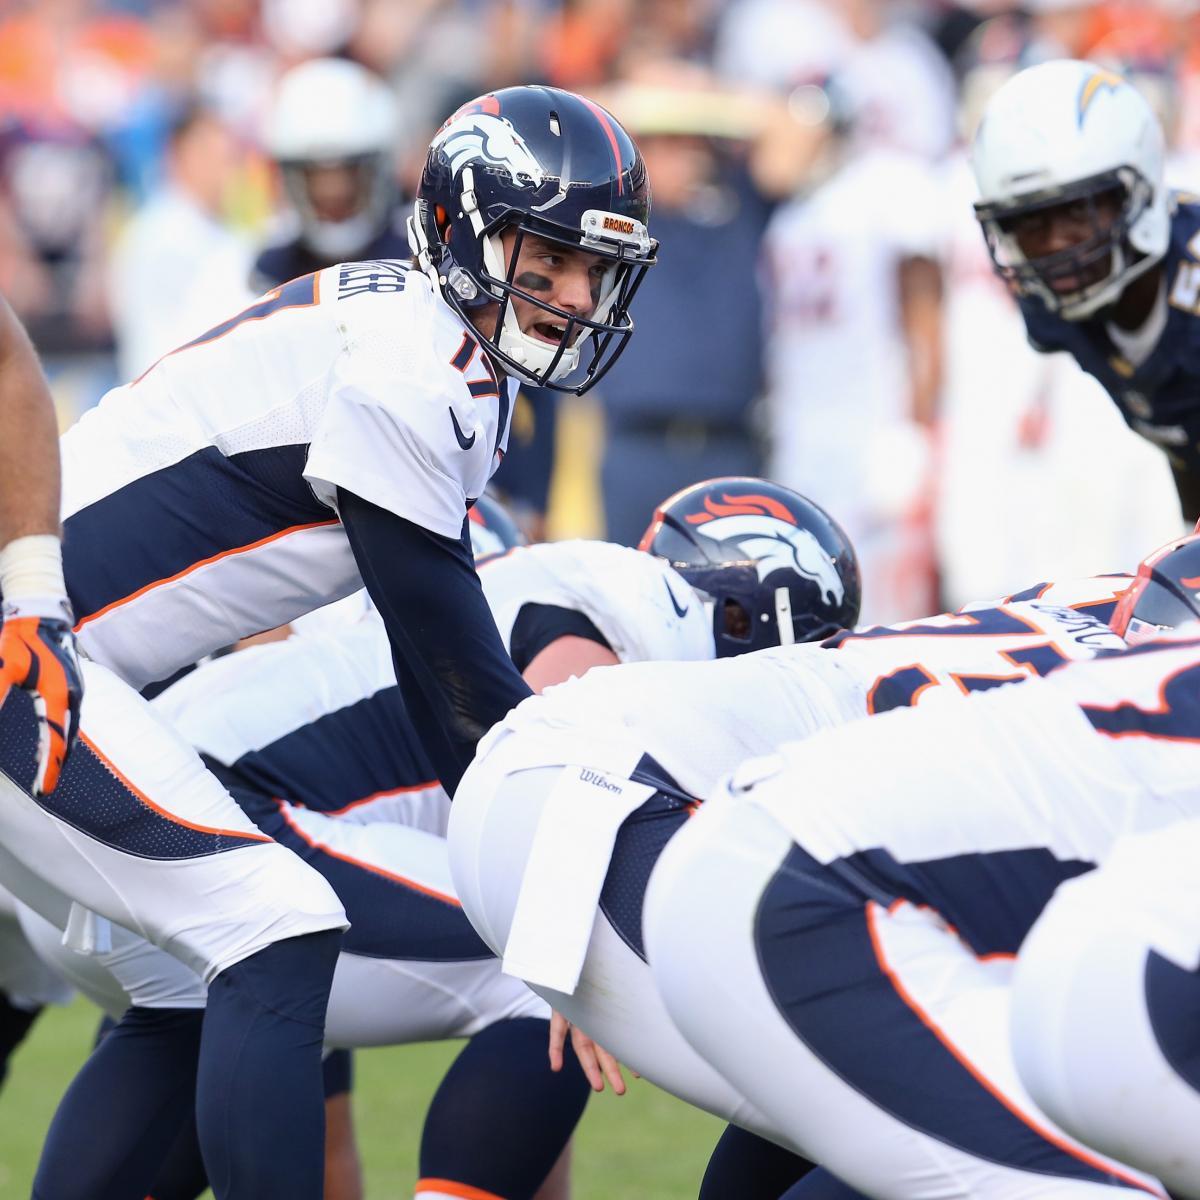 Denver News Road Conditions: Denver Broncos Vs. Pittsburgh Steelers: Full Denver Game